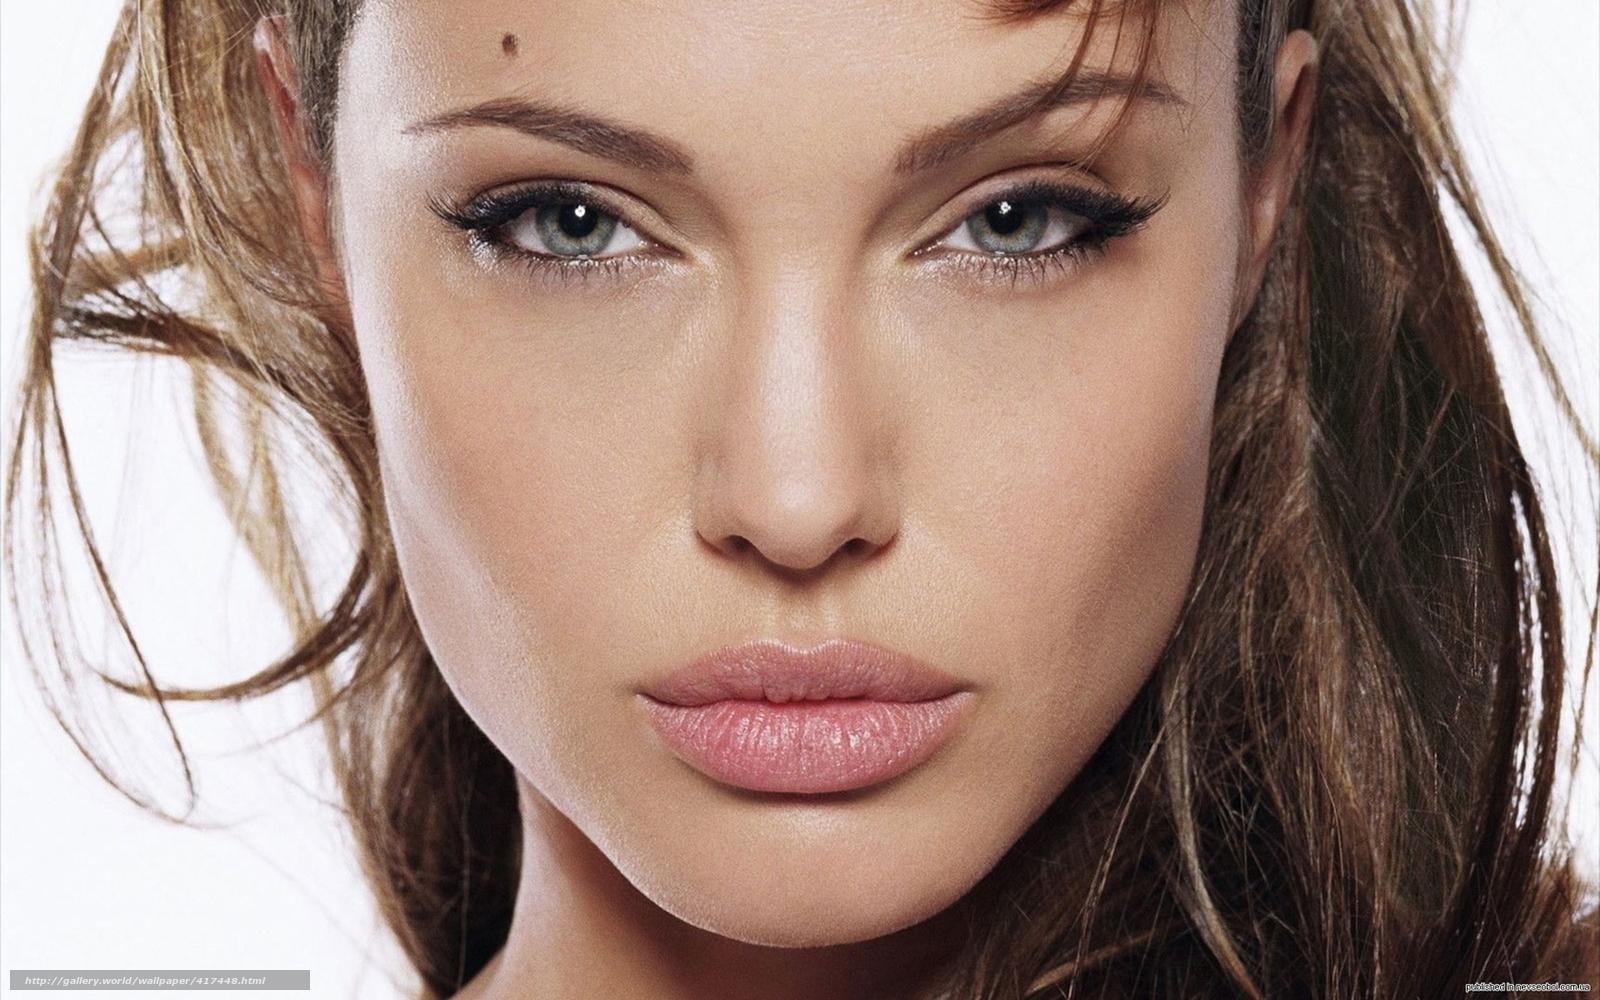 Tlcharger fond d 39 ecran fille angelina jolie visage for Fond ecran jolie fille